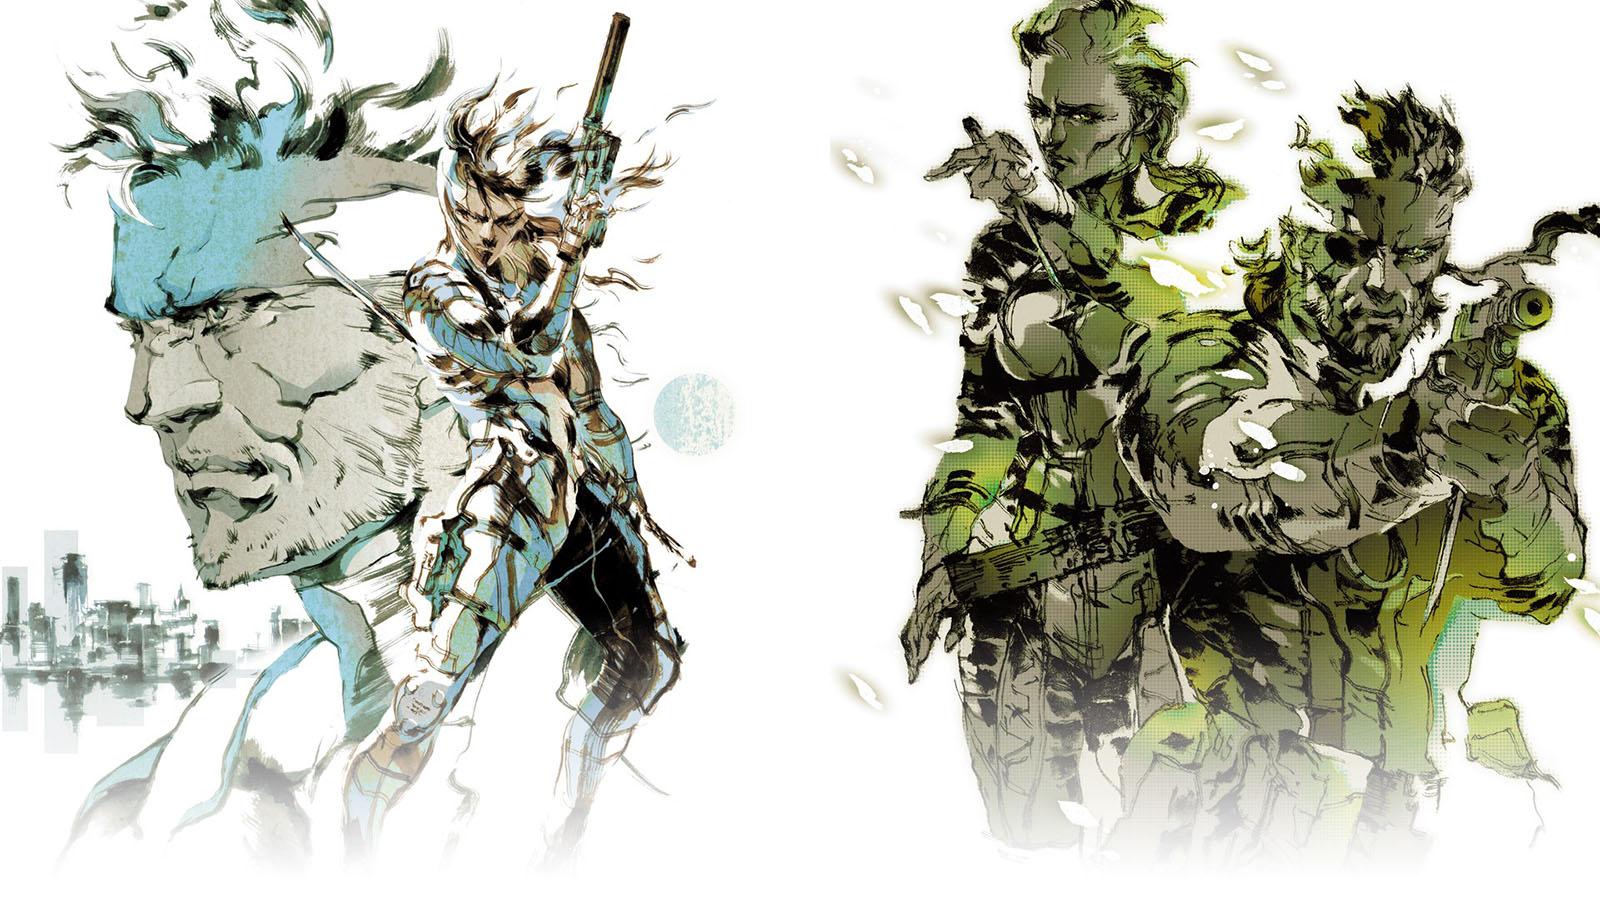 Metal-Gear-Solid-2-3-HD